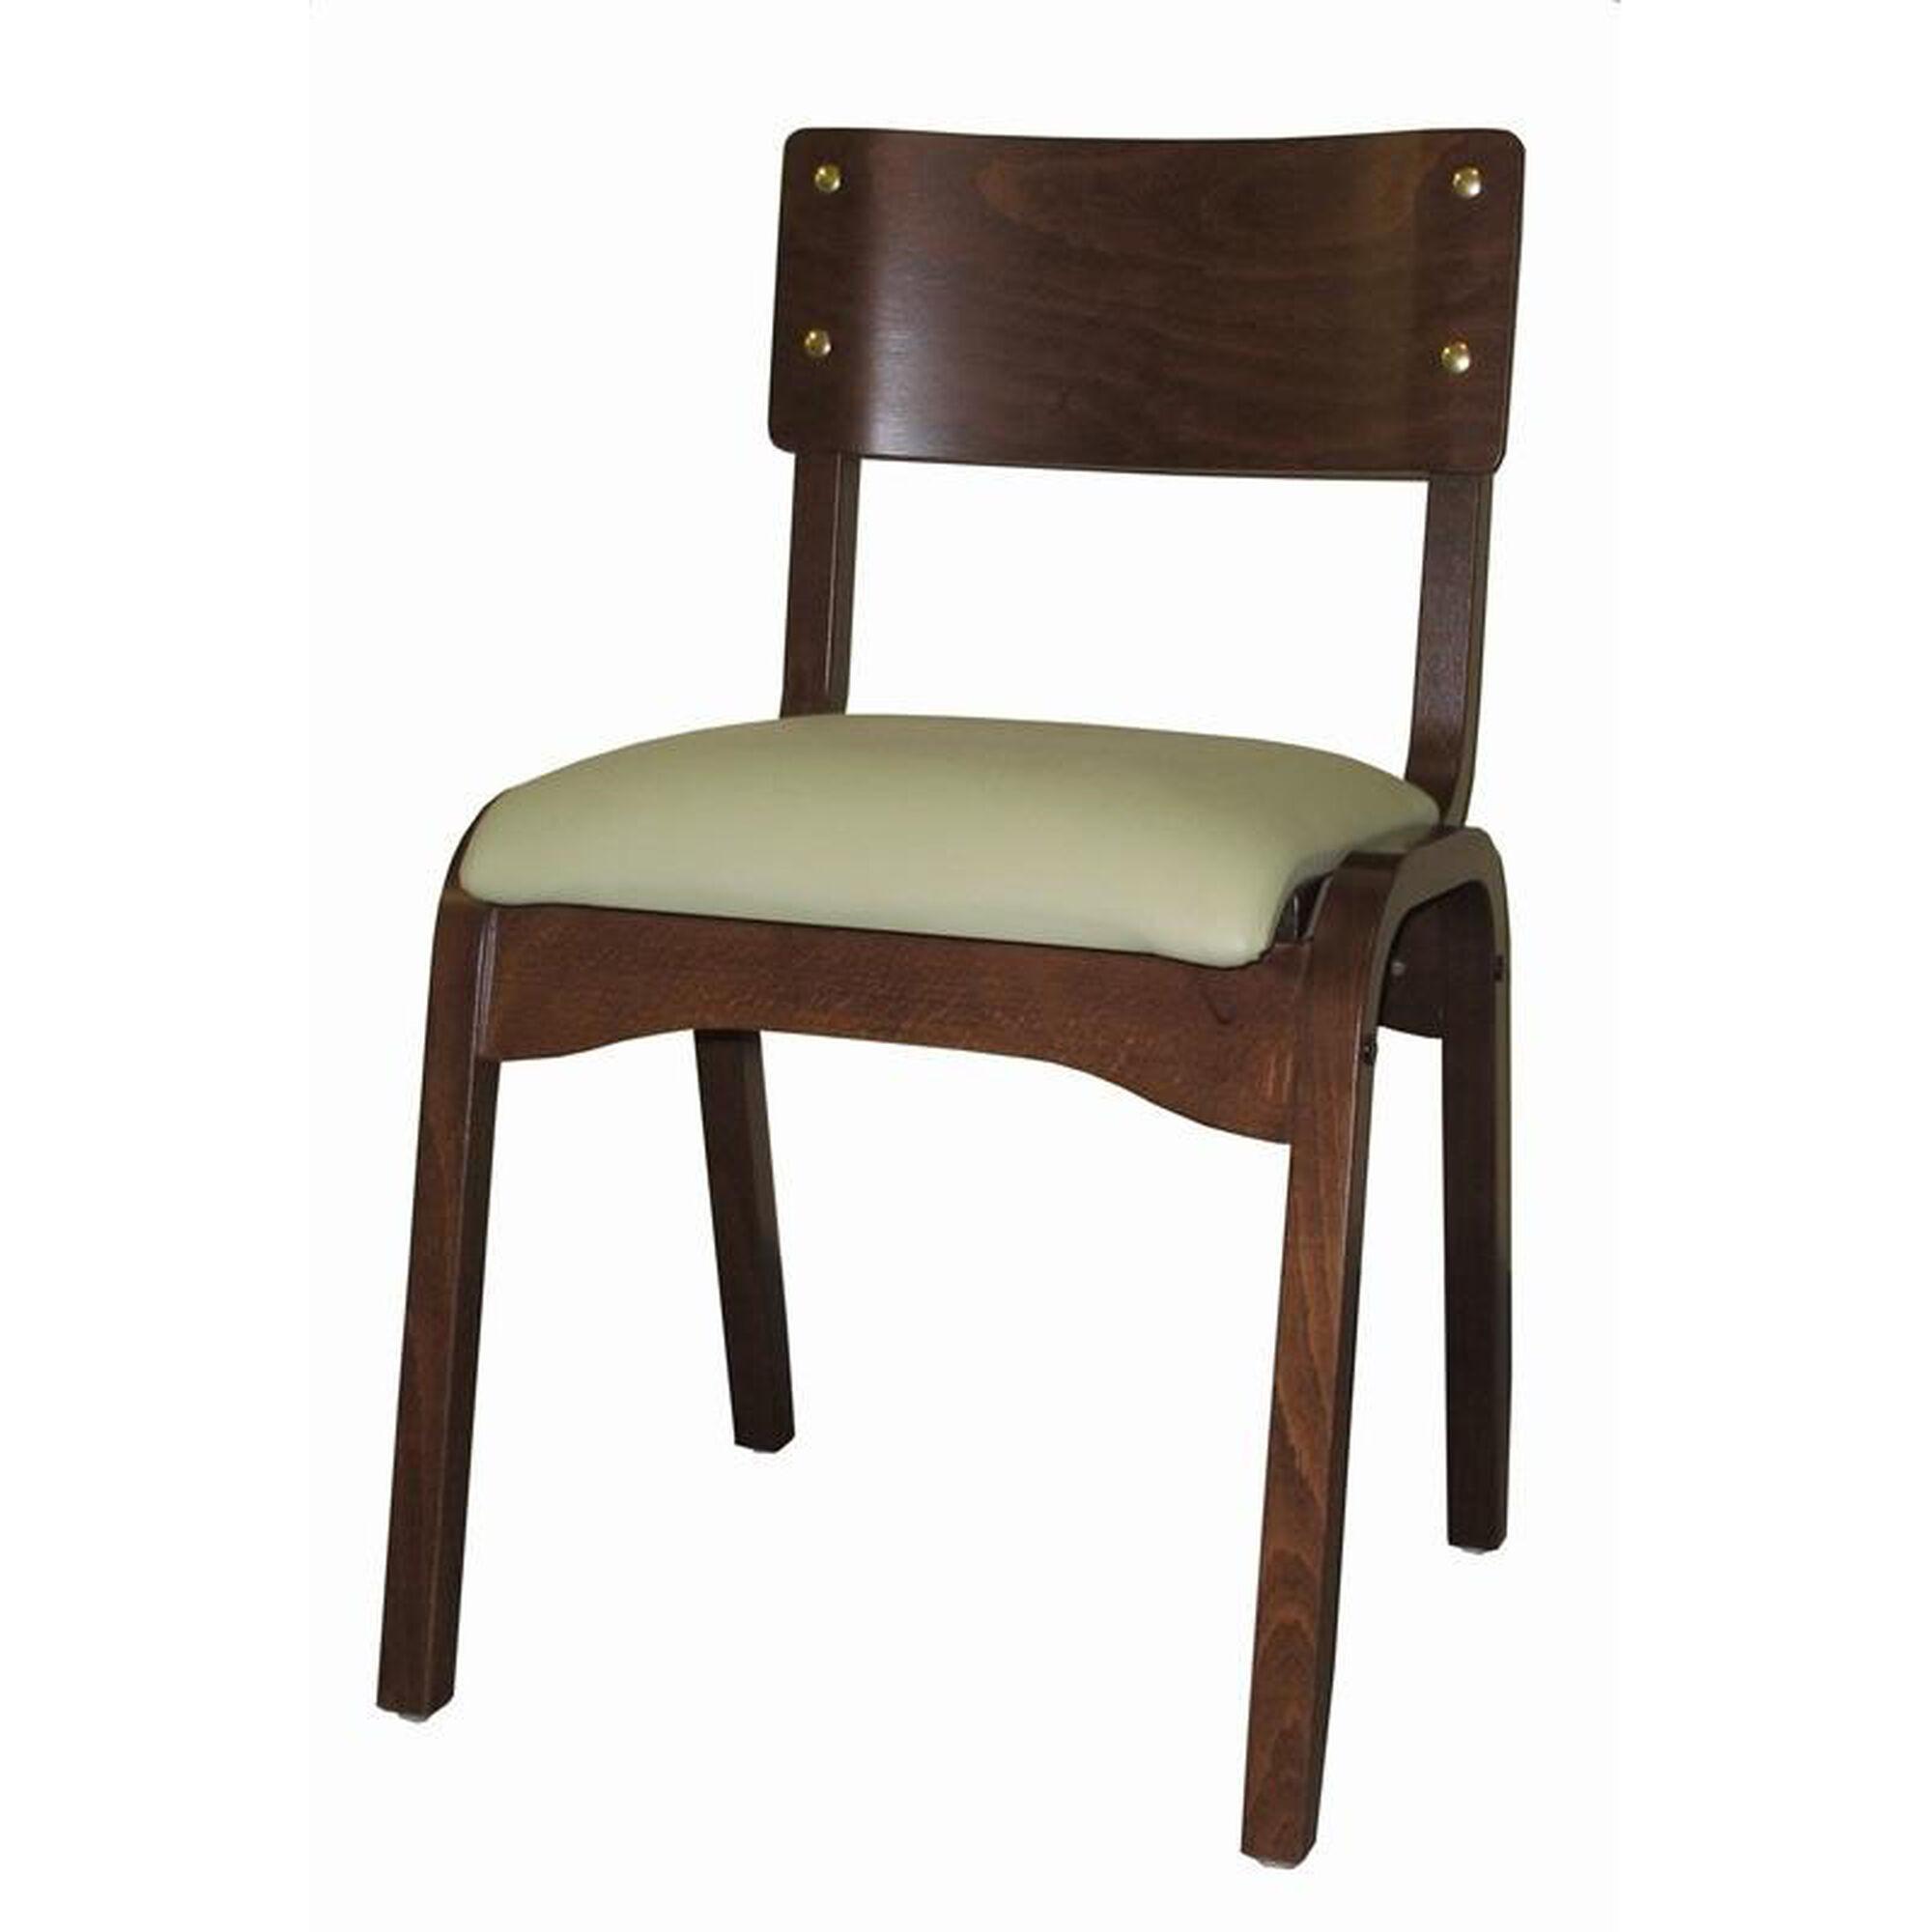 custom carlo chair grade 1 carlo stacking chair gr1 c. Black Bedroom Furniture Sets. Home Design Ideas